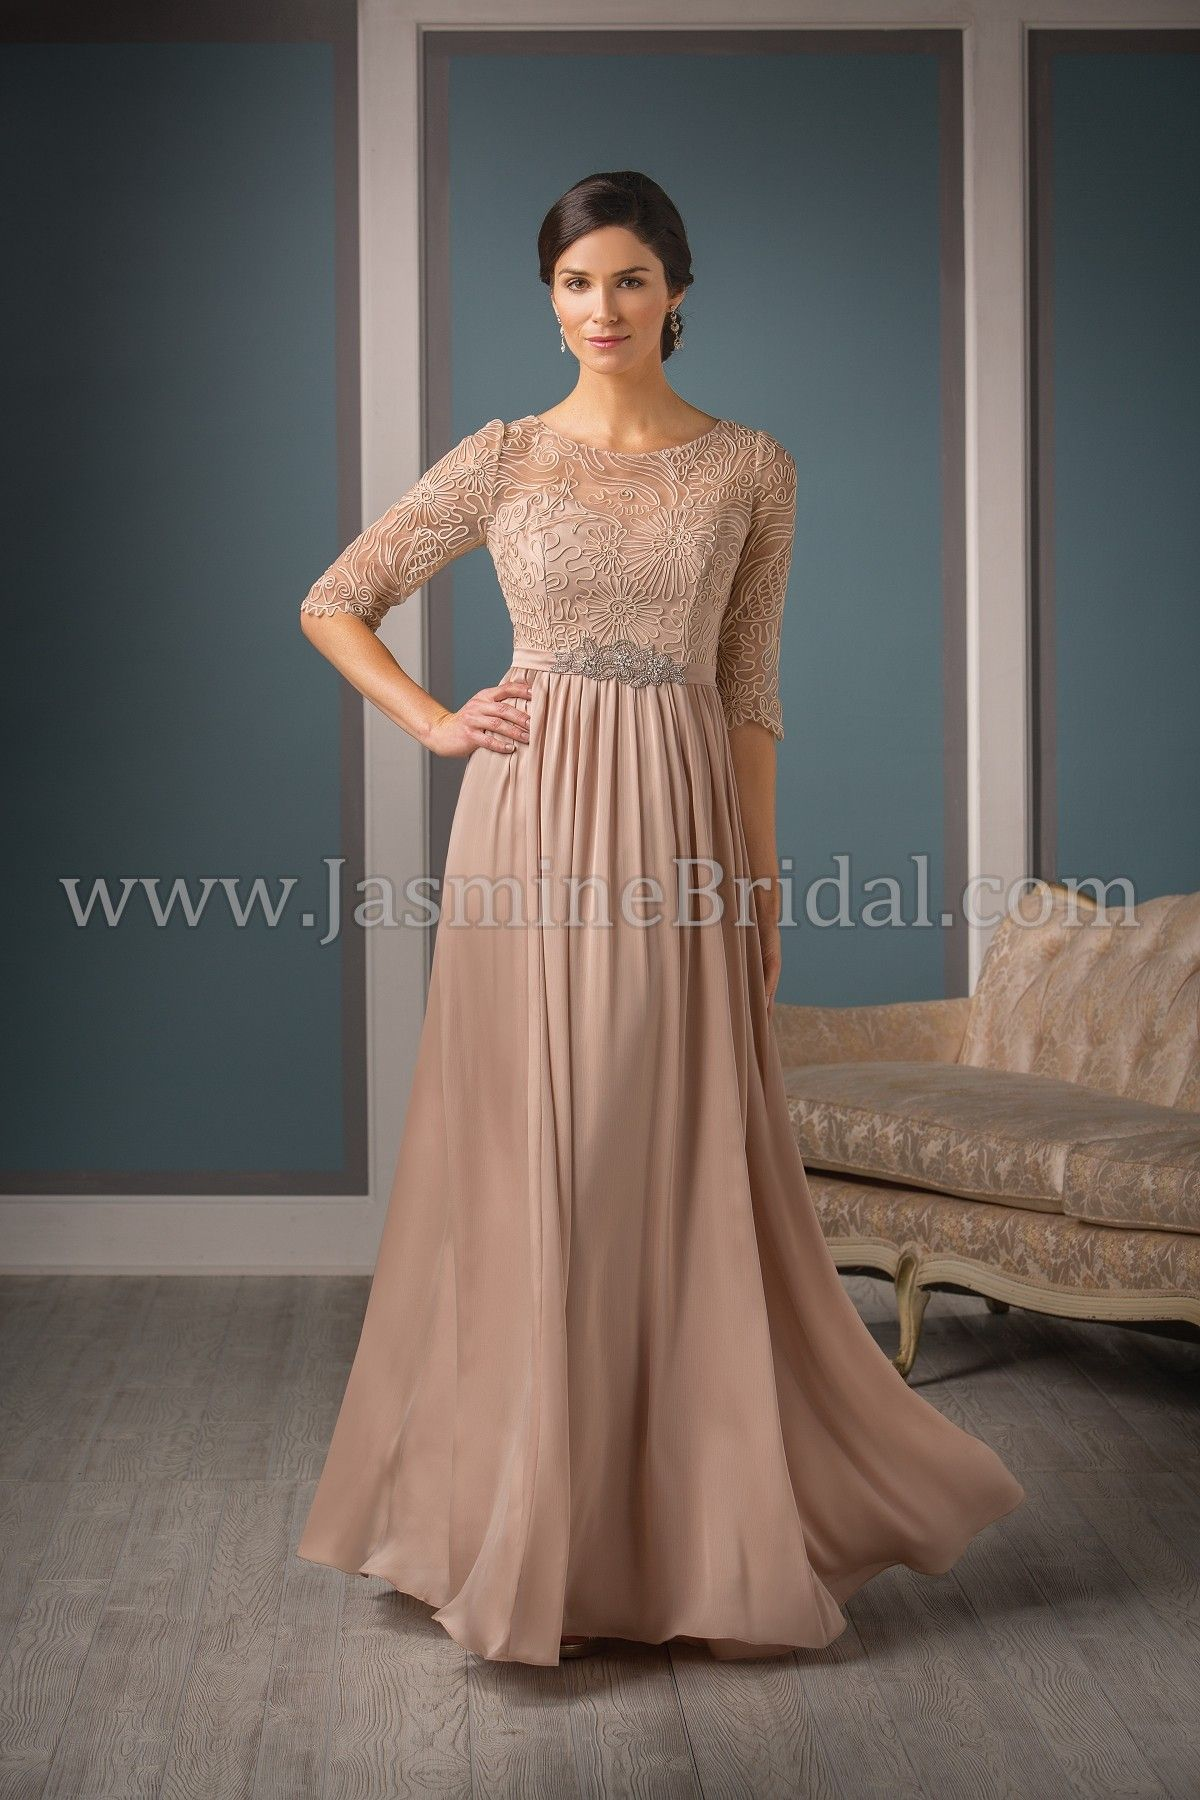 46af24dc76e Jasmine Bridal Jade Couture Style K188002 in Mica